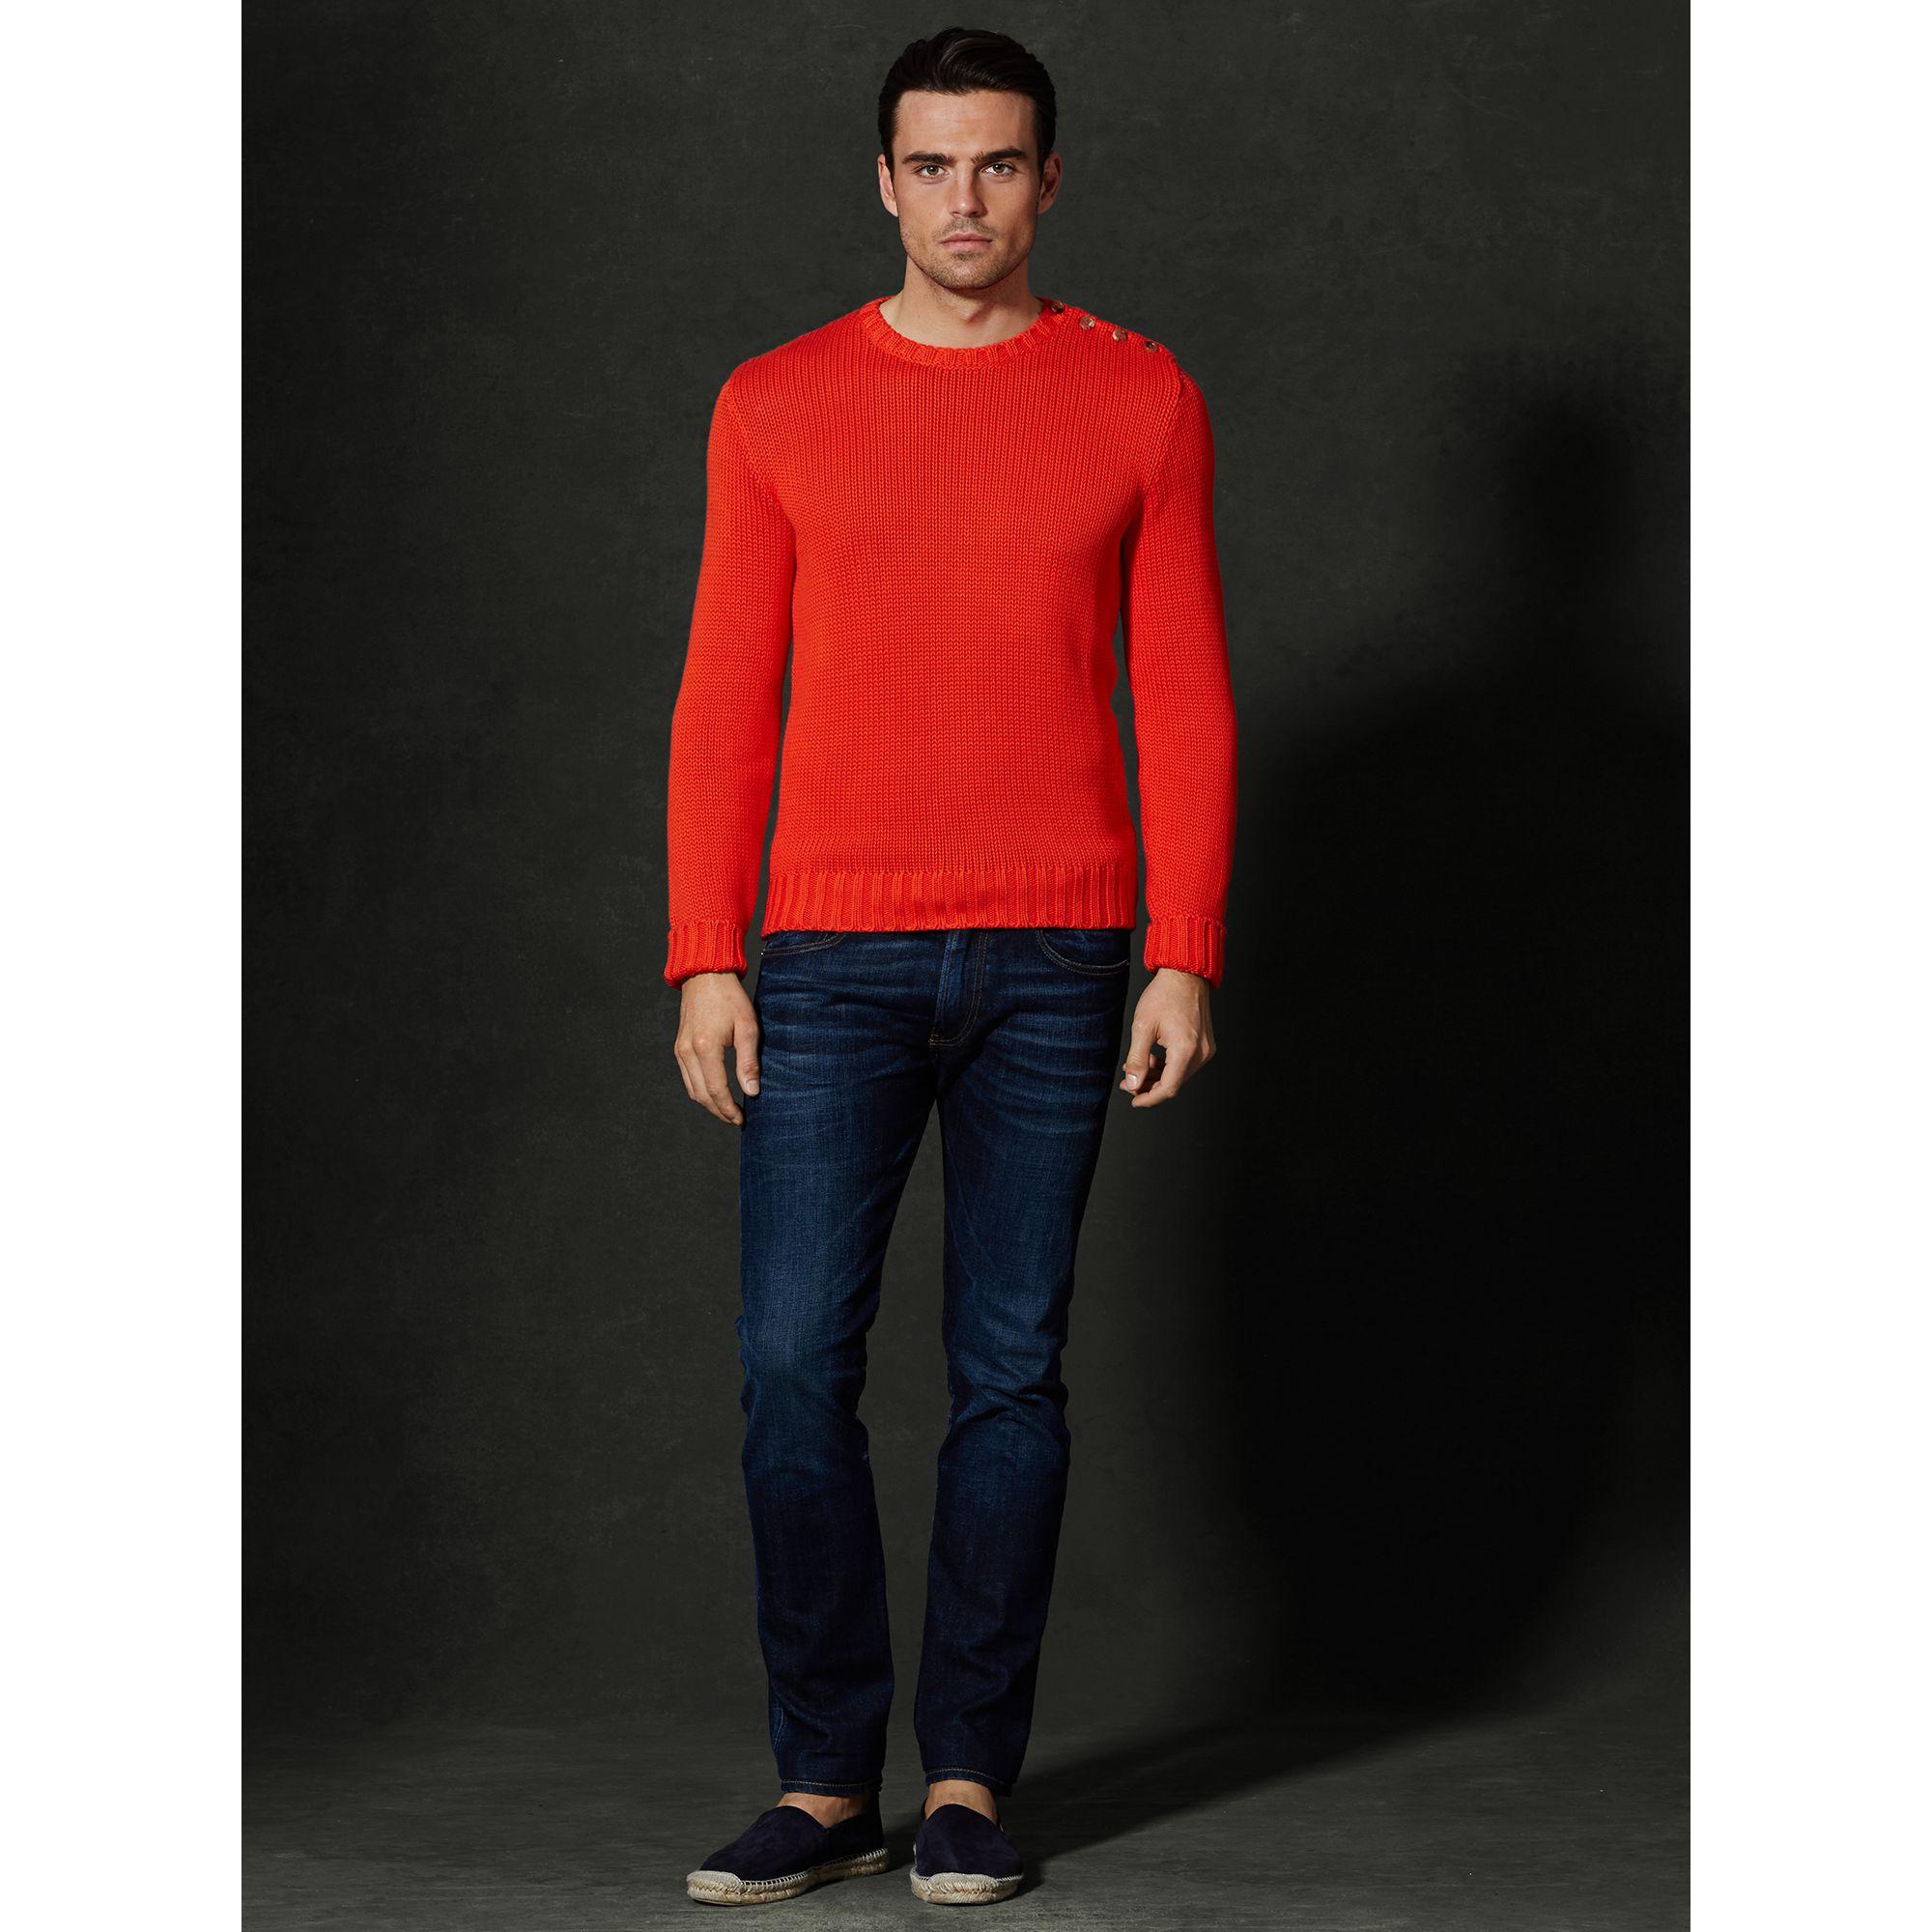 Ralph lauren purple label Buttoned-Shoulder Sweater in Red for Men ...